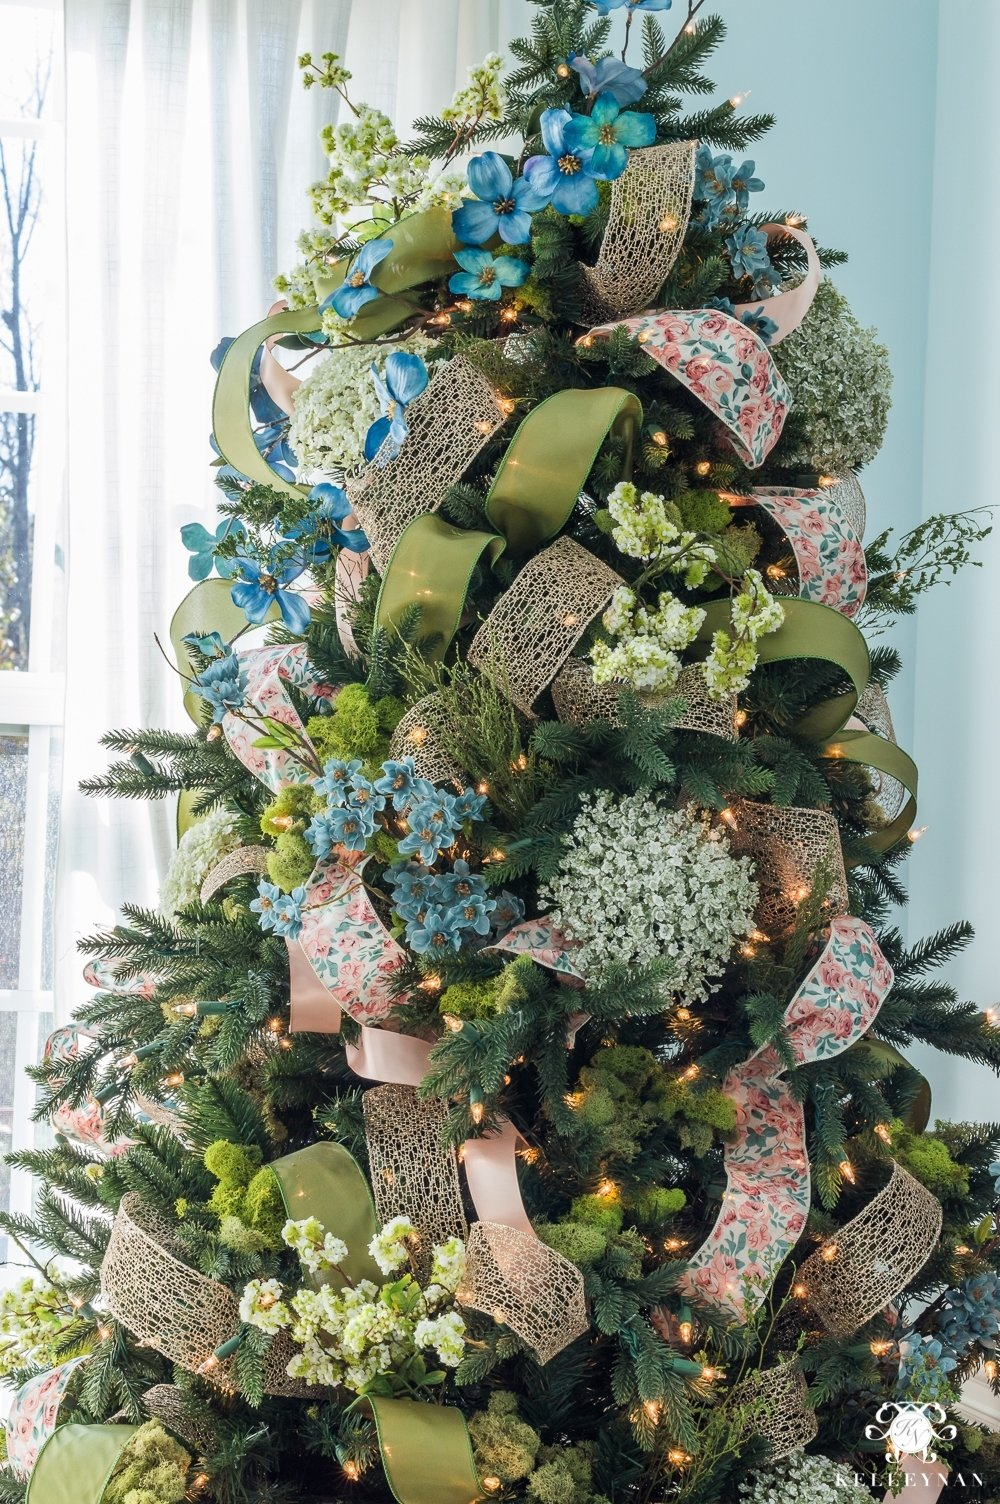 10 Spectacular Christmas Tree Decorating Ideas With Ribbon how to decorate a christmas tree with ribbon kelley nan 2021